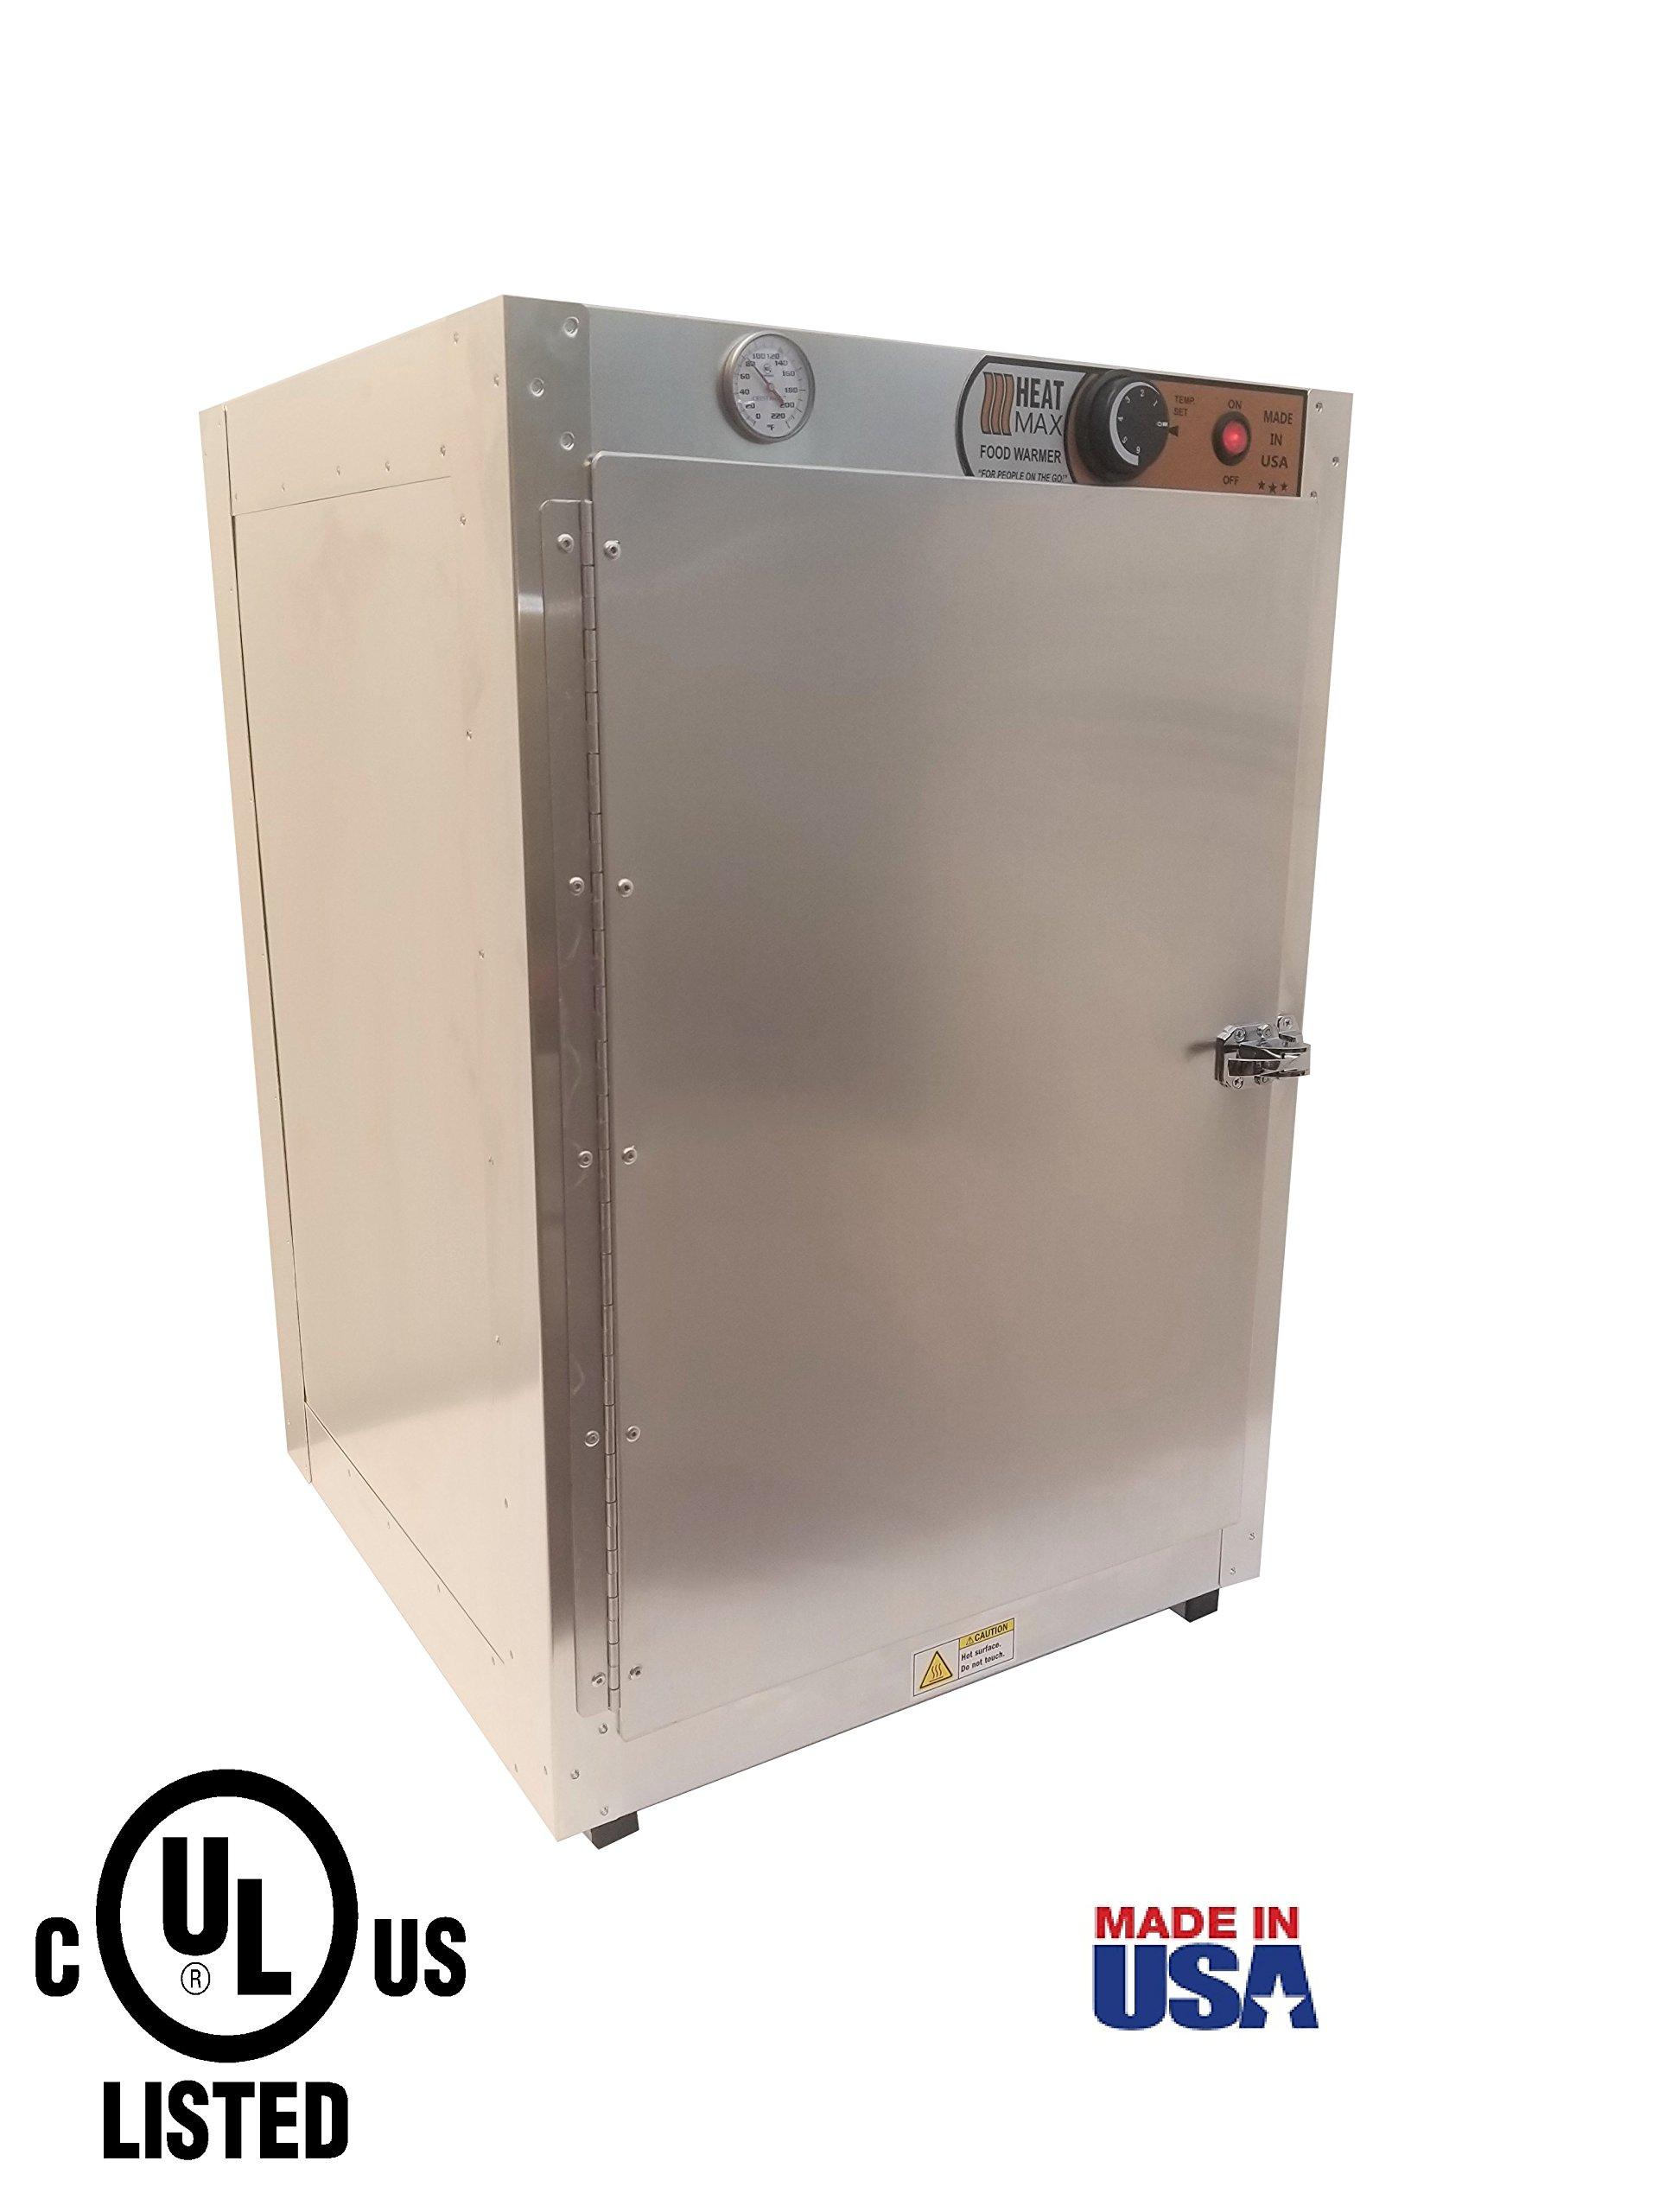 HeatMax Commercial 19x19x29 Hot Box Food Warmer, Pizza Warmer, Catering Hot Food Warmer, PIzza, Pastry, Patty Warmer by HeatMax